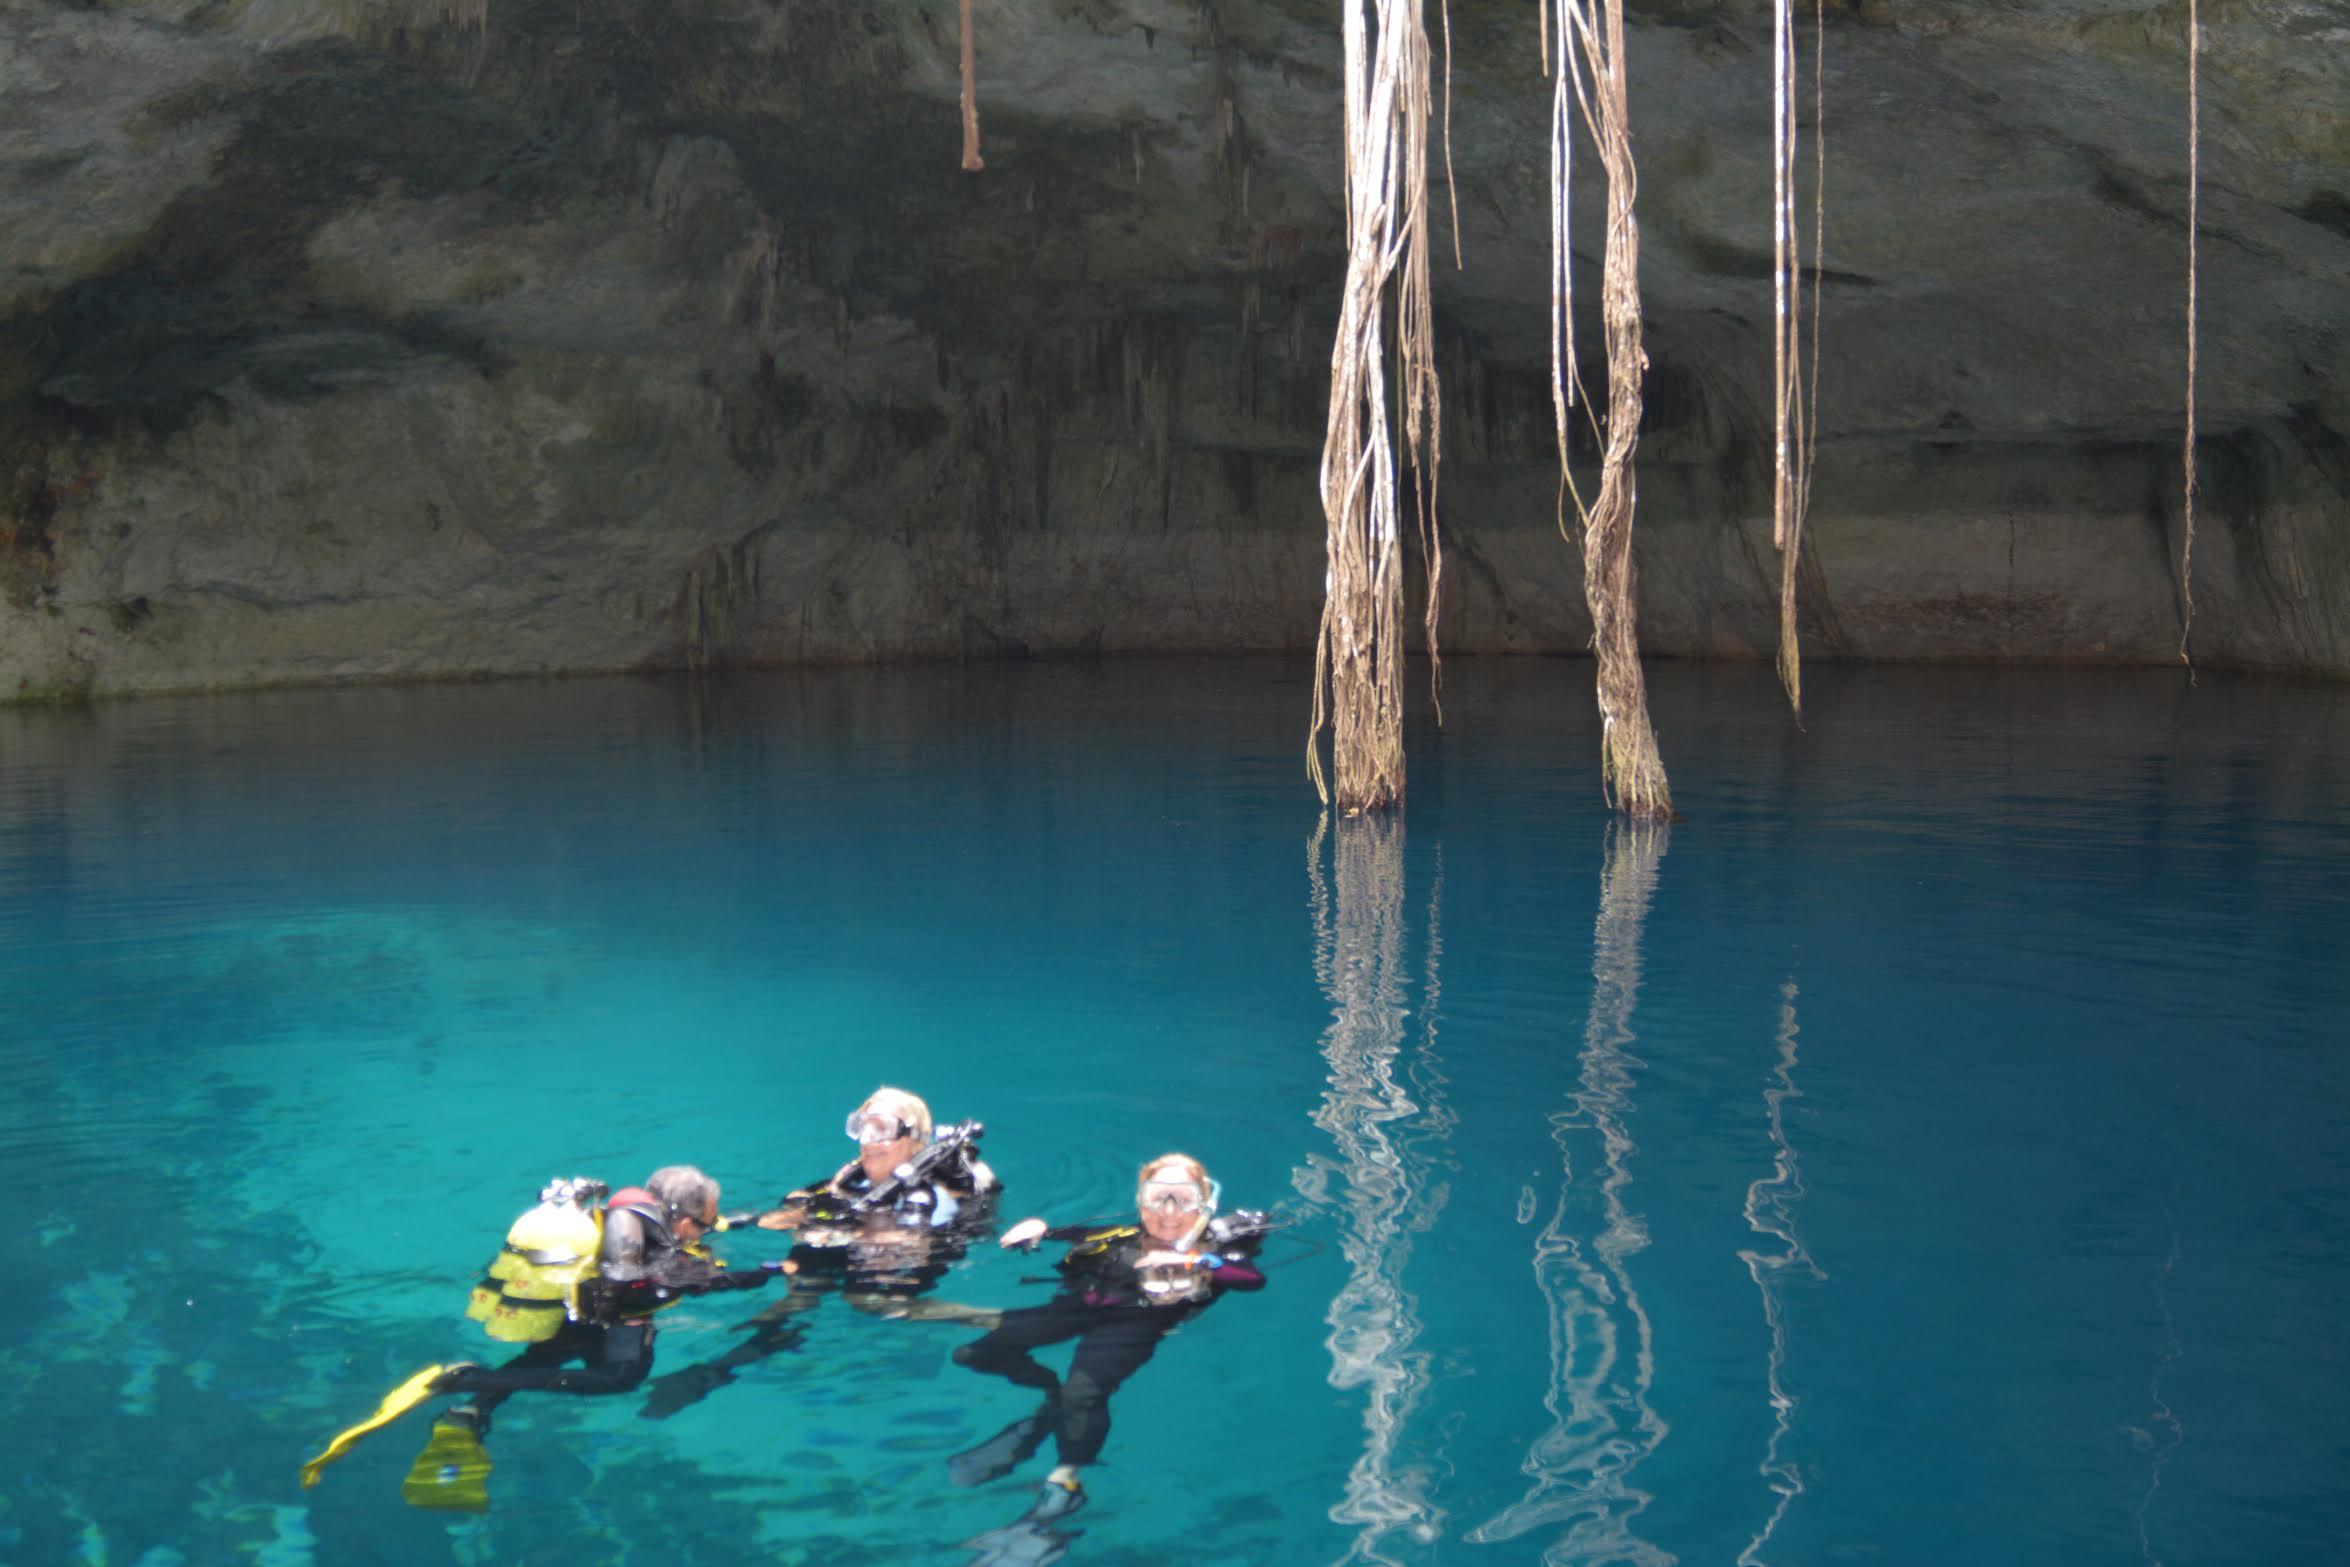 Scuba Diving in Mexico